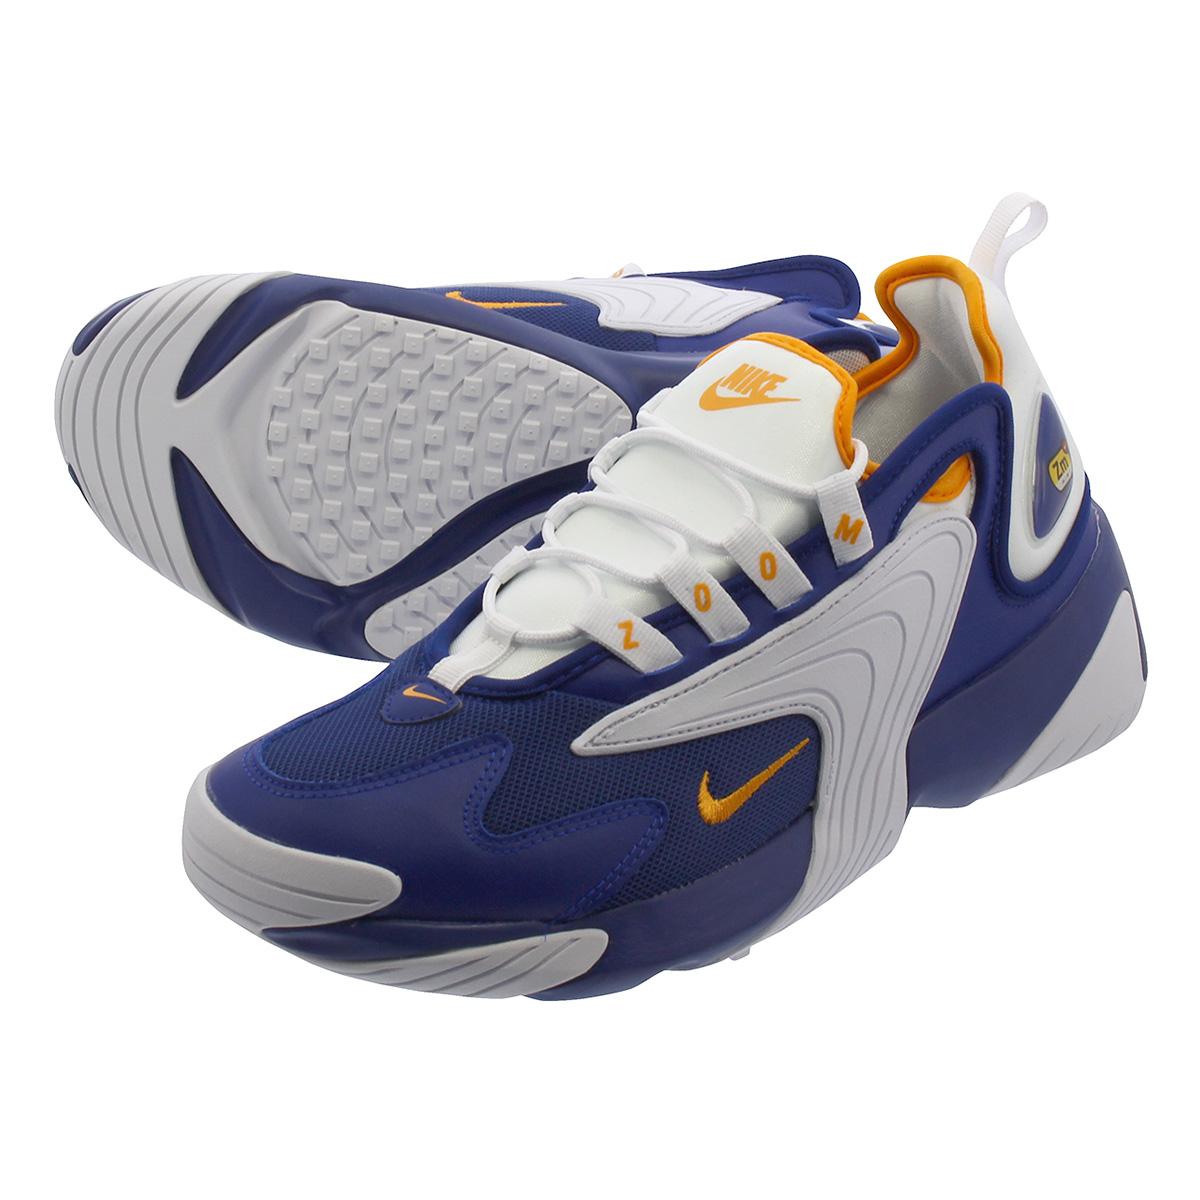 8d8998377ed6 LOWTEX PLUS  NIKE ZOOM 2K Nike zoom 2K DEEP ROYAL BLUE ORANGE PEEL ...